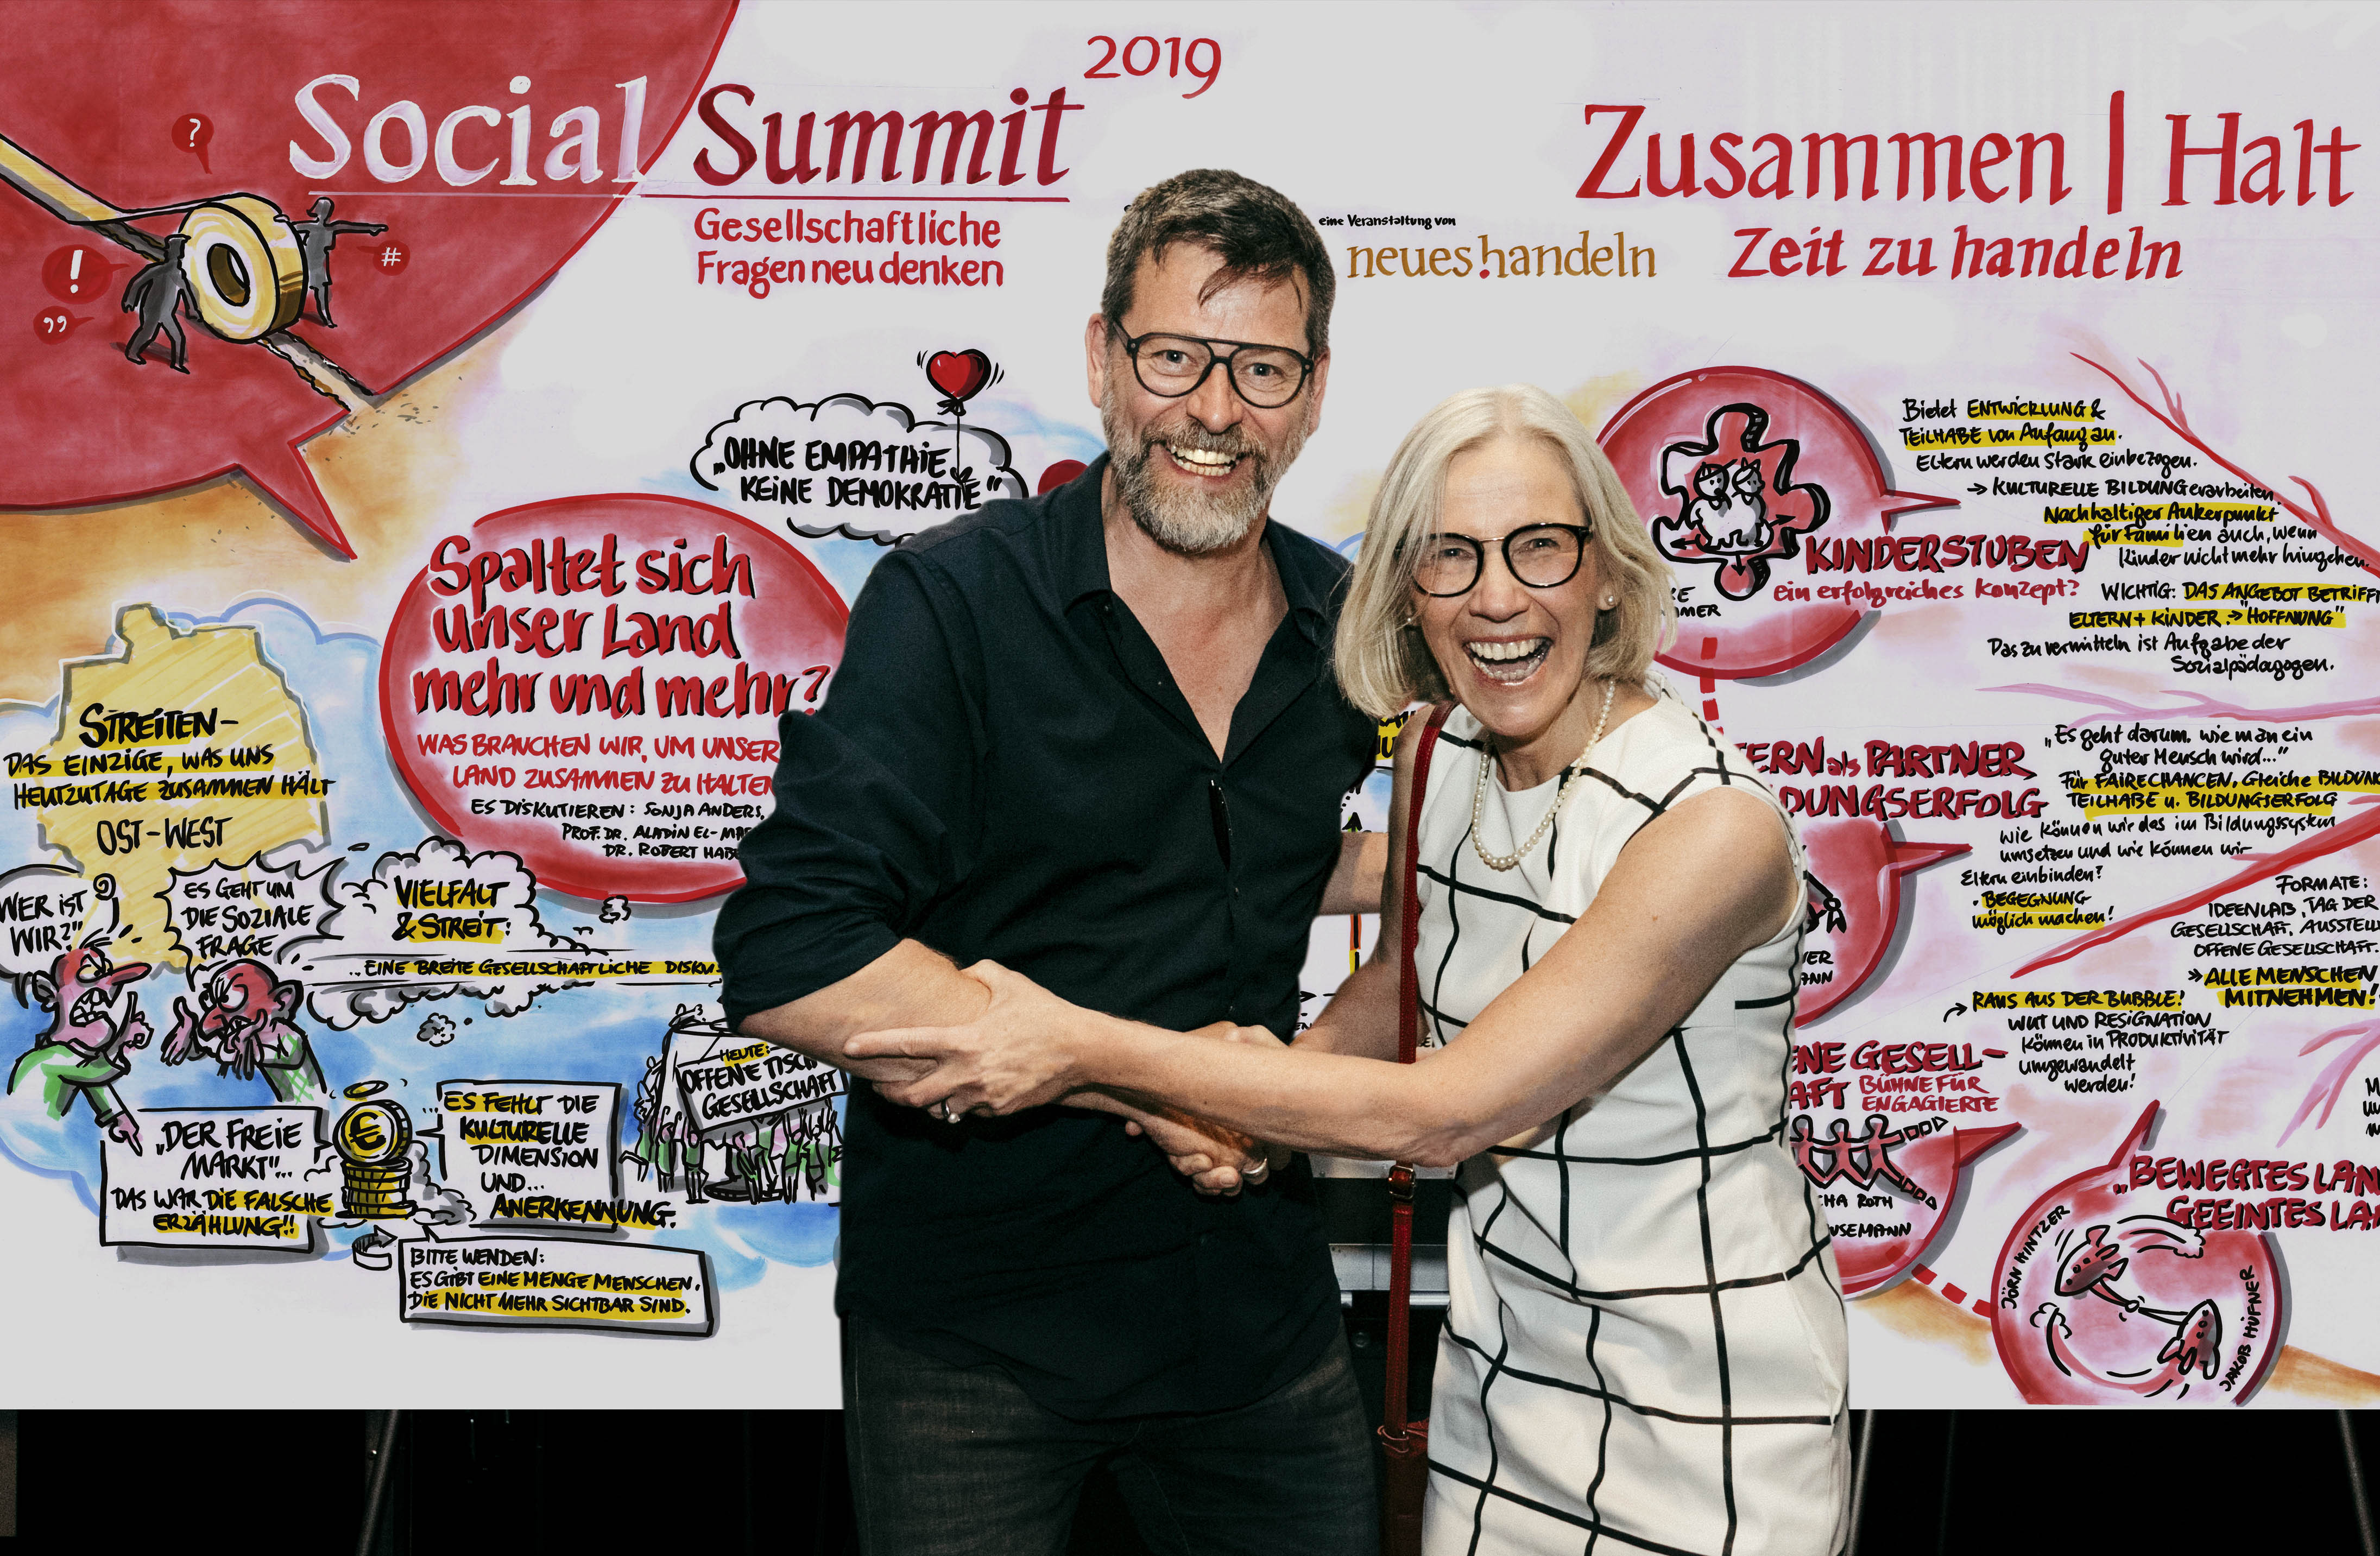 Social Summit 2019 - Christoph Illigens visualisiert den Prozess